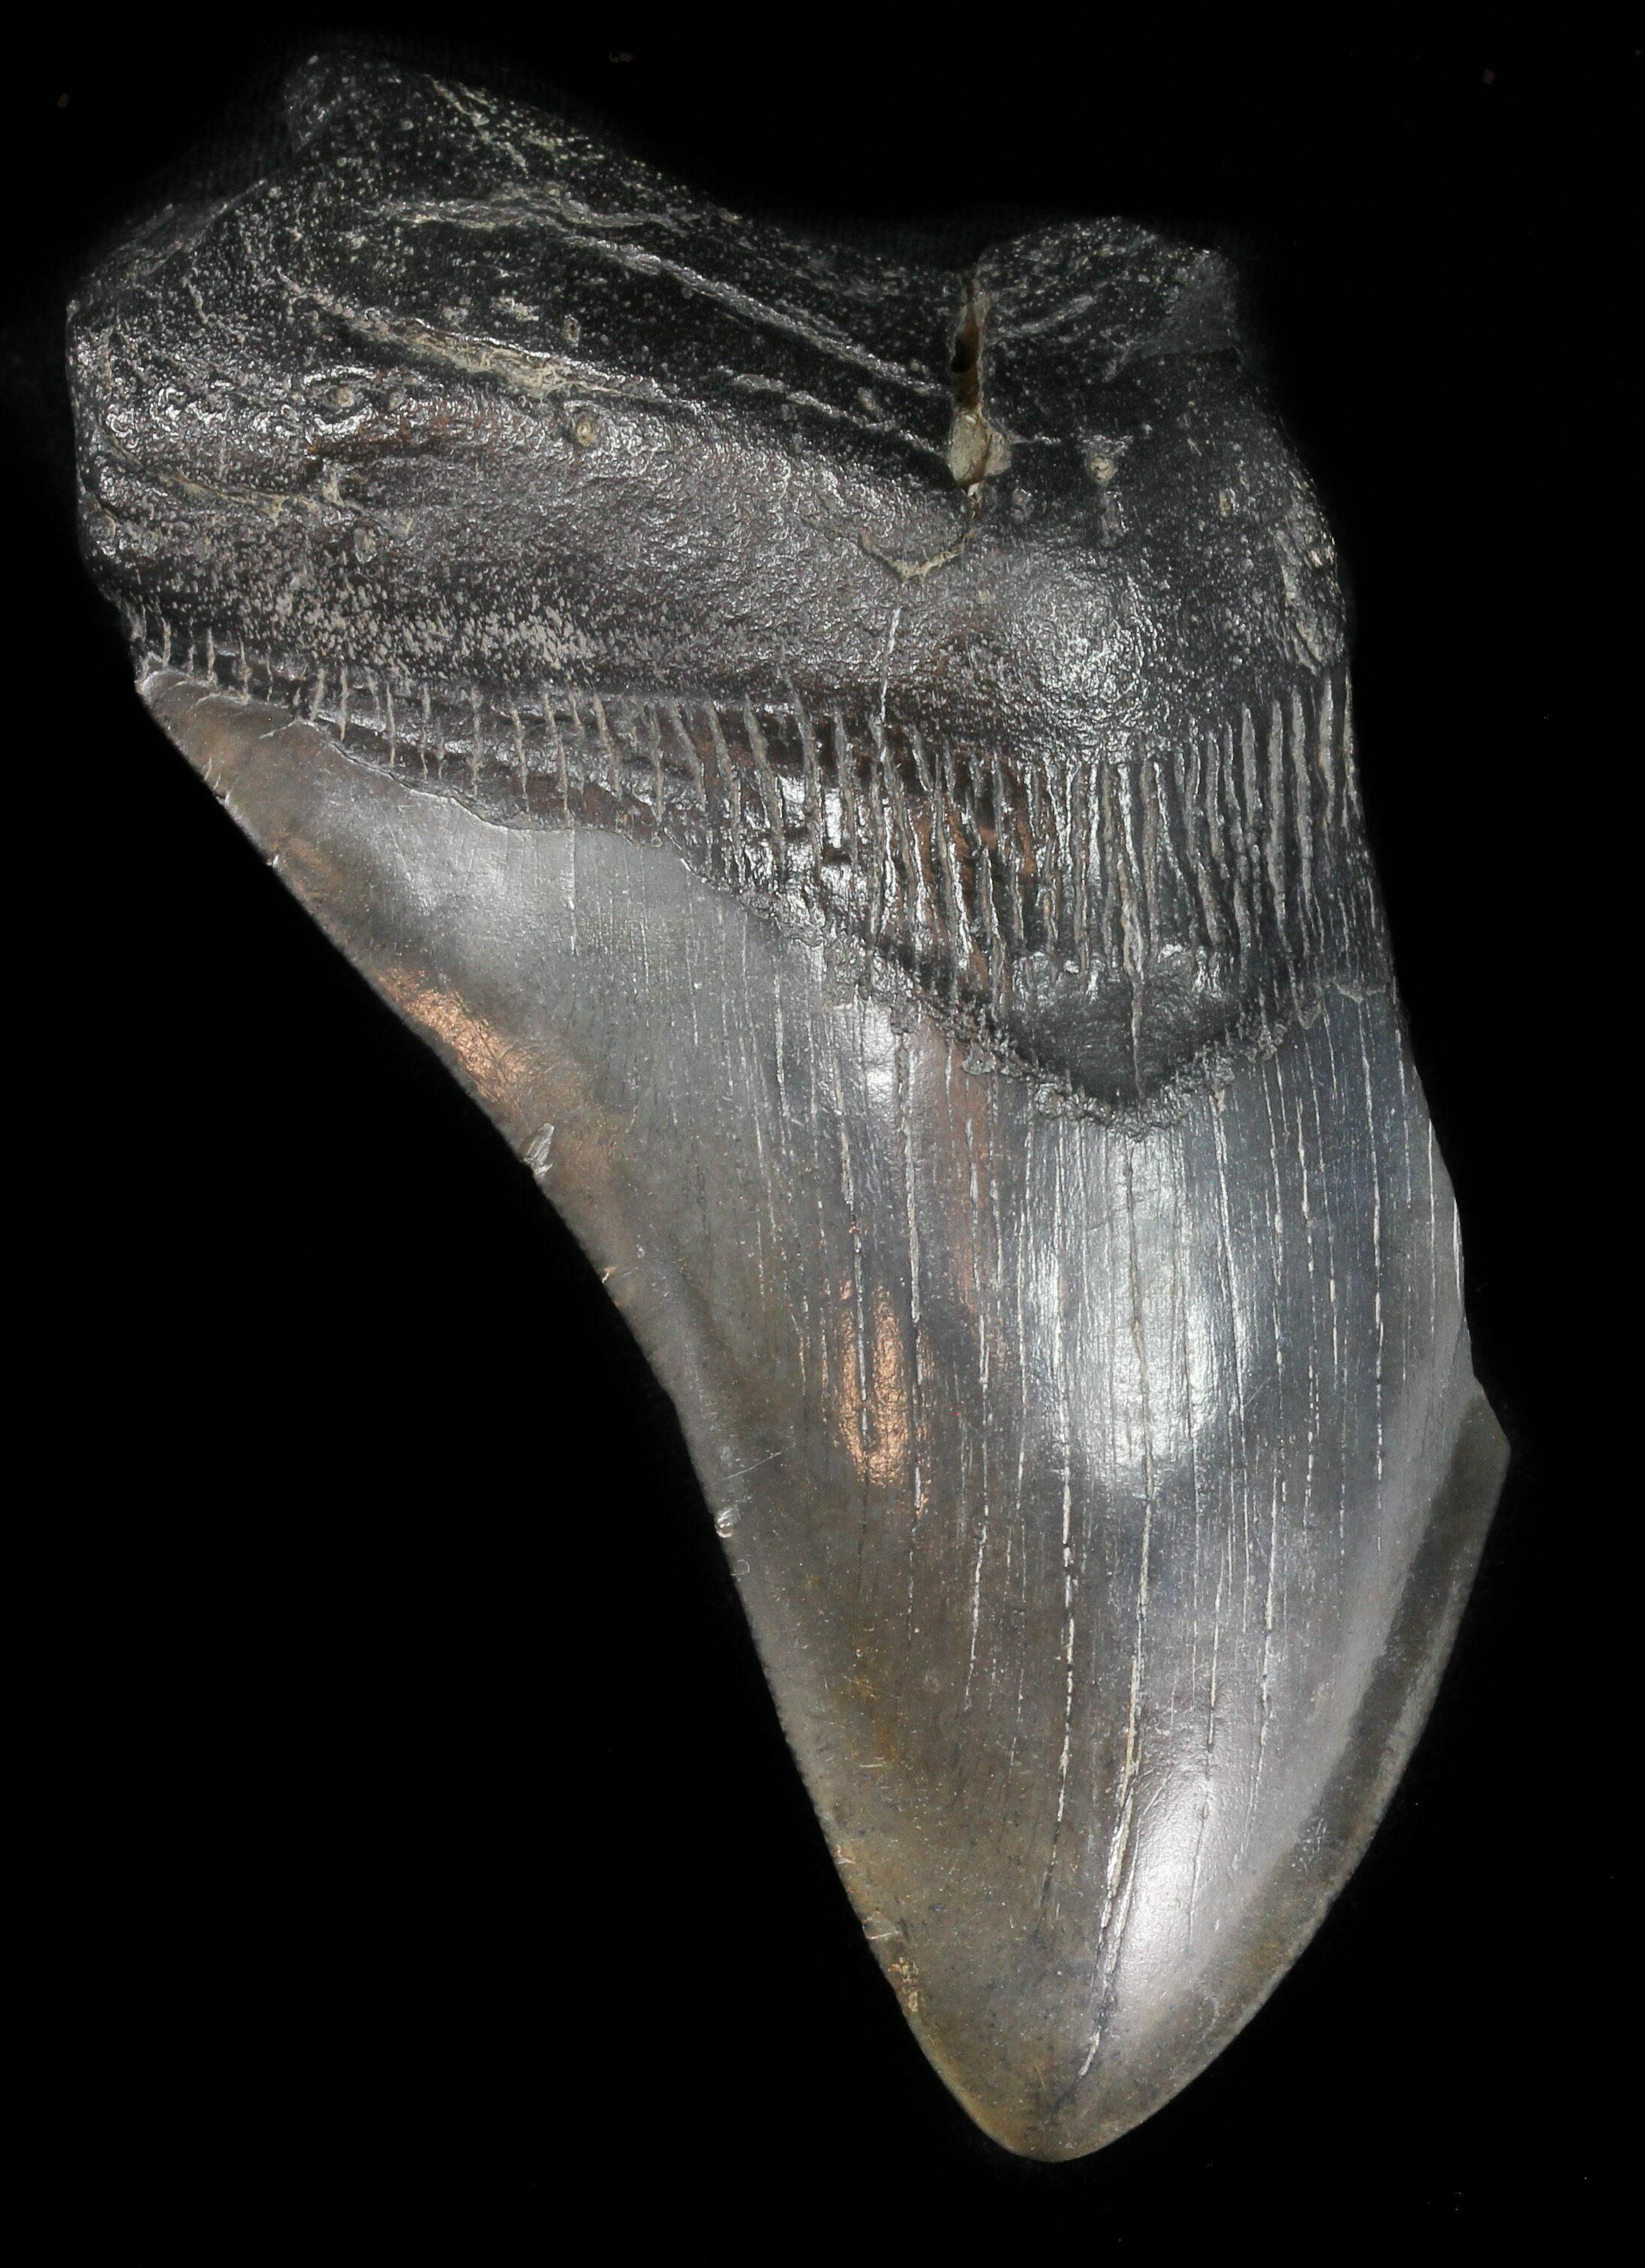 Partial, 5.18 Megalodon Tooth - Georgia For Sale (#47619) - FossilEra.com